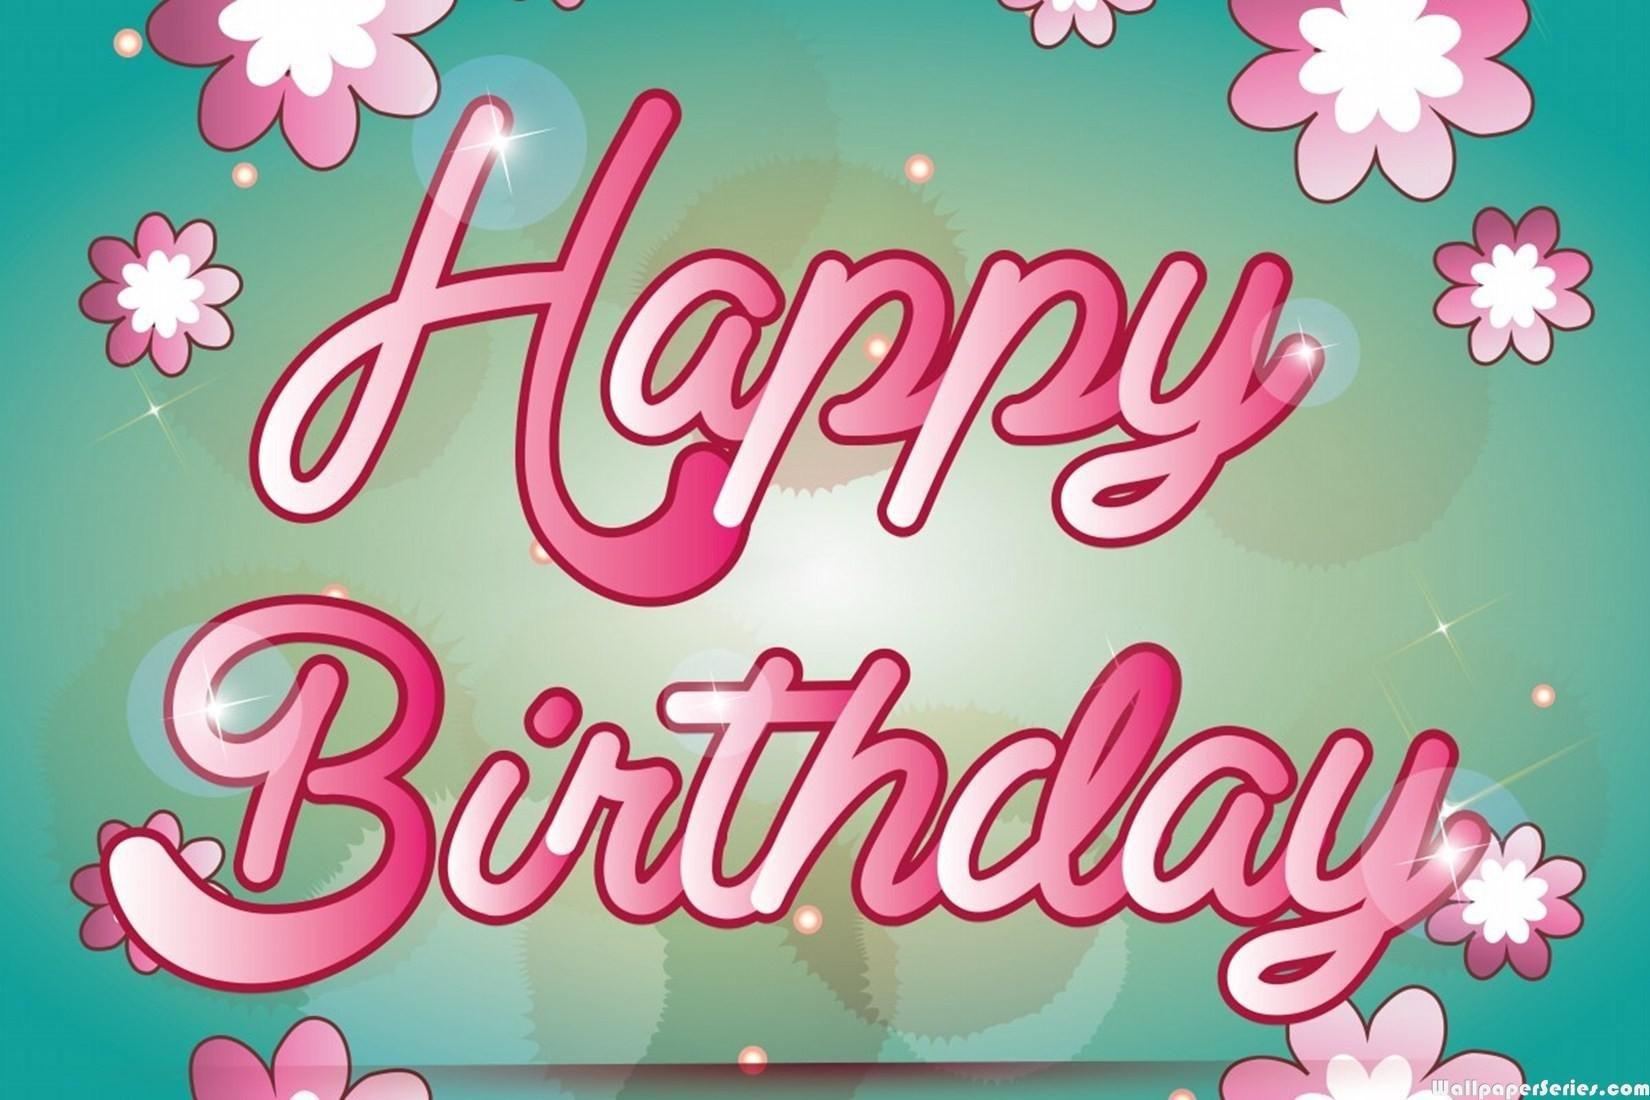 Pin By Lola Jarrell On Birthdays Pinterest Happy Birthday And